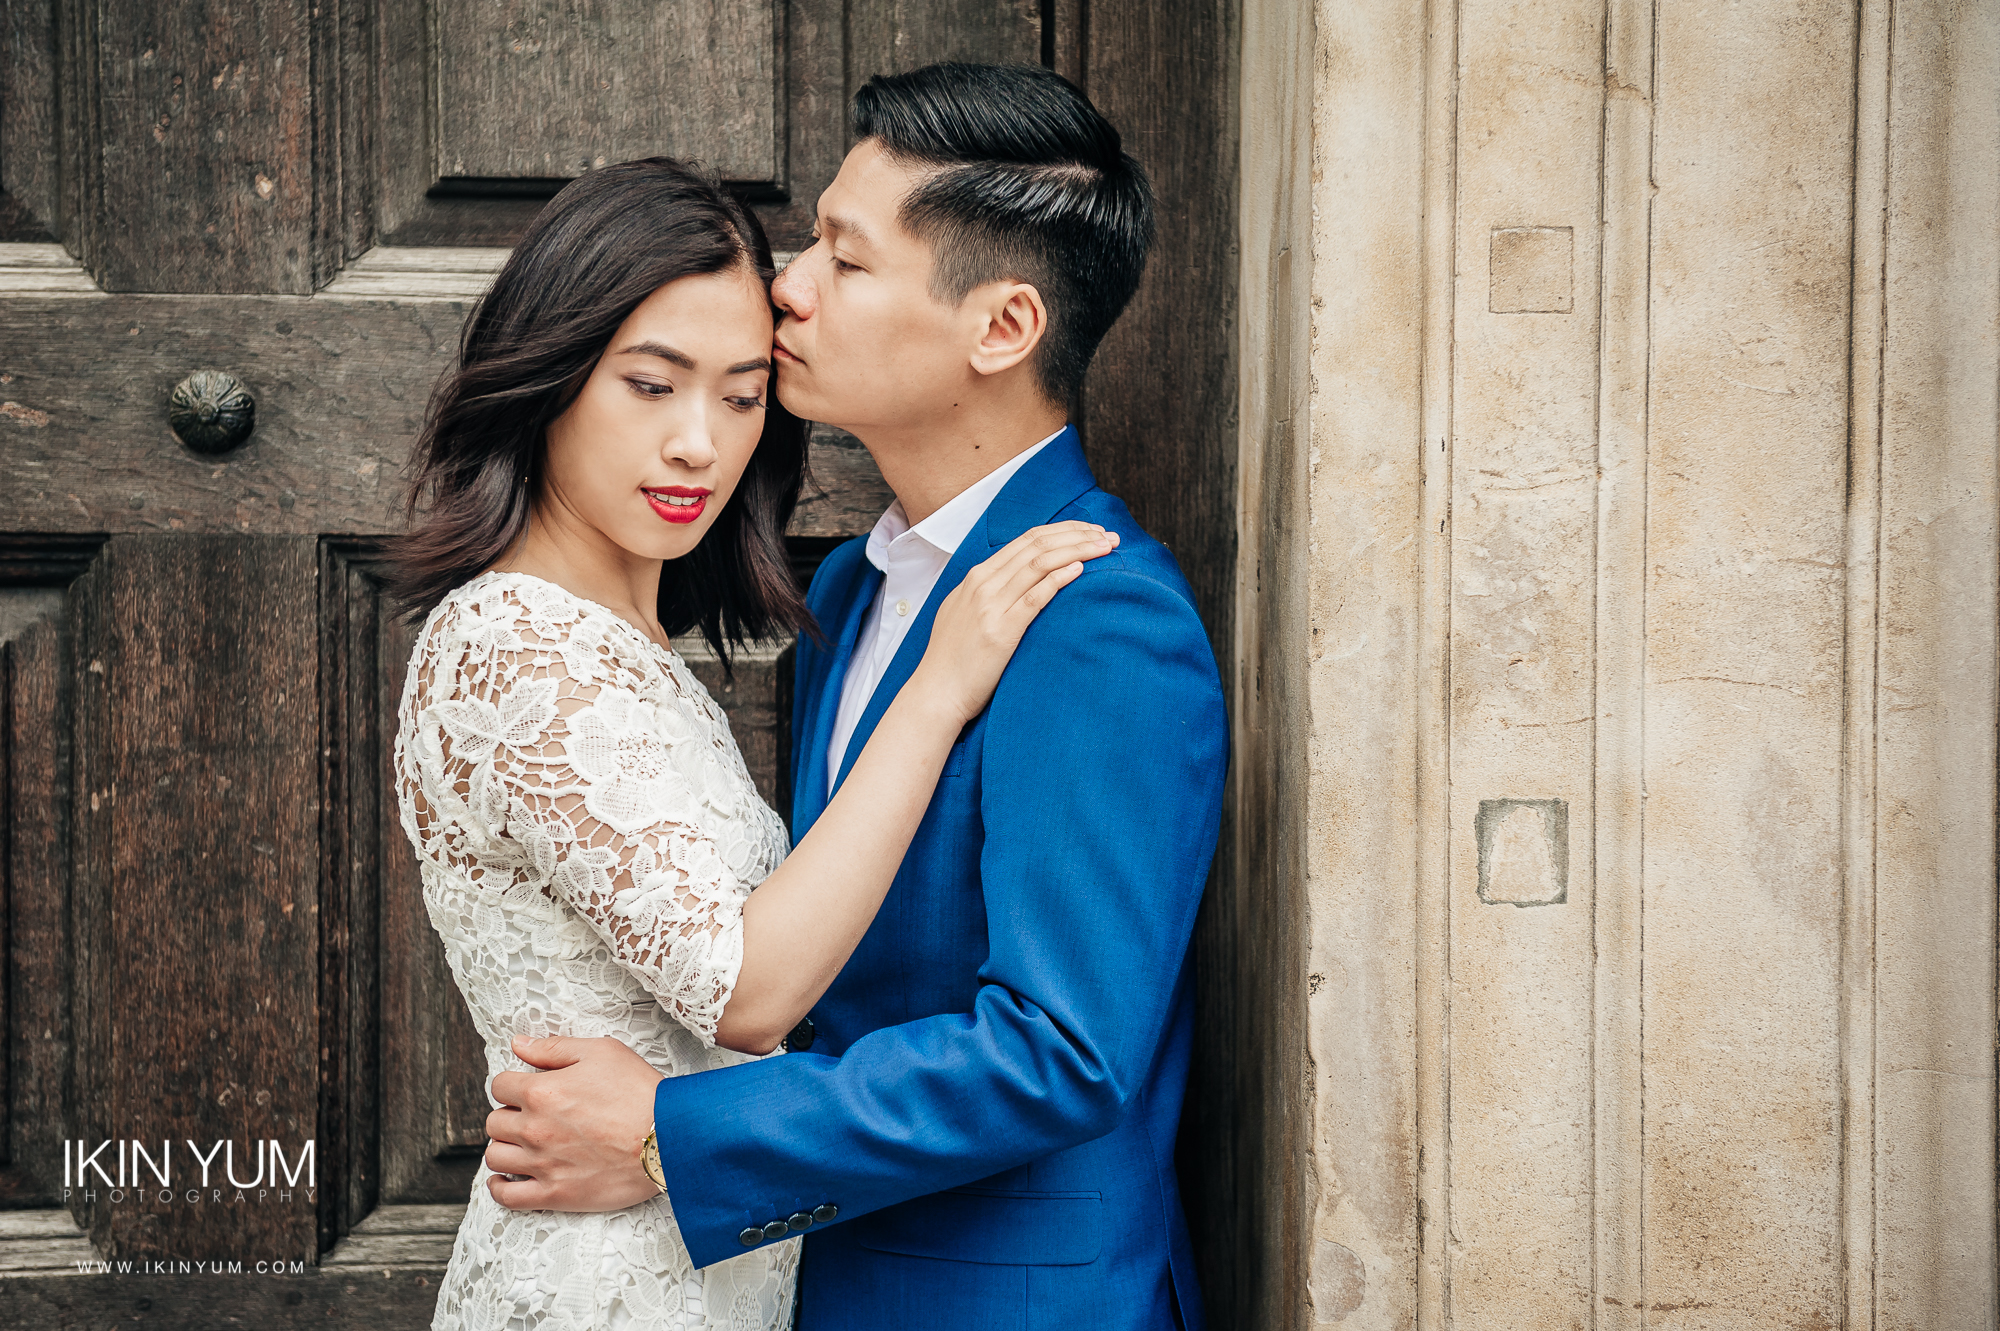 Natalie & Duncan Wedding Day - Ikin Yum Photography-118.jpg